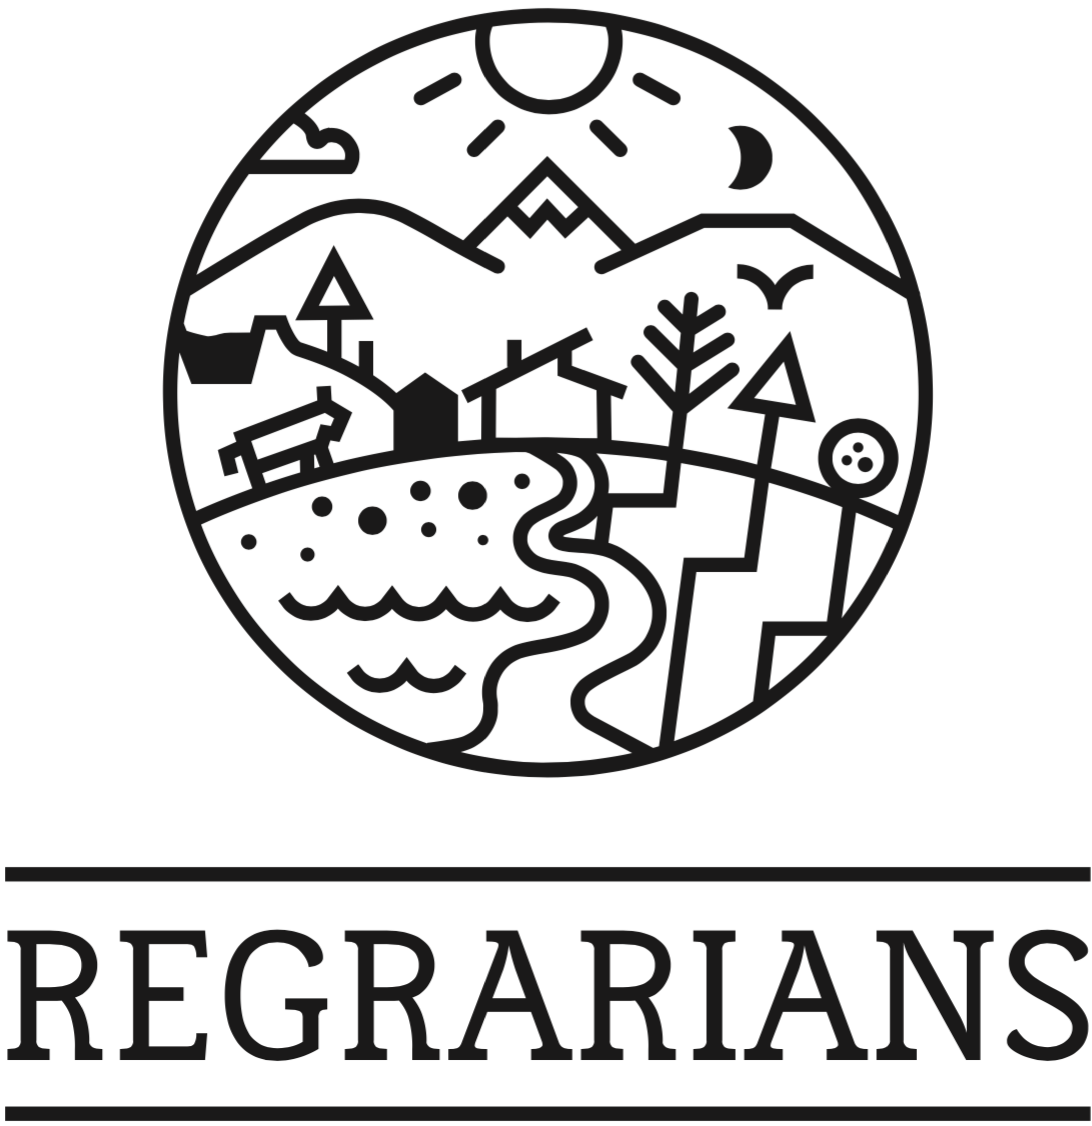 Regrarians